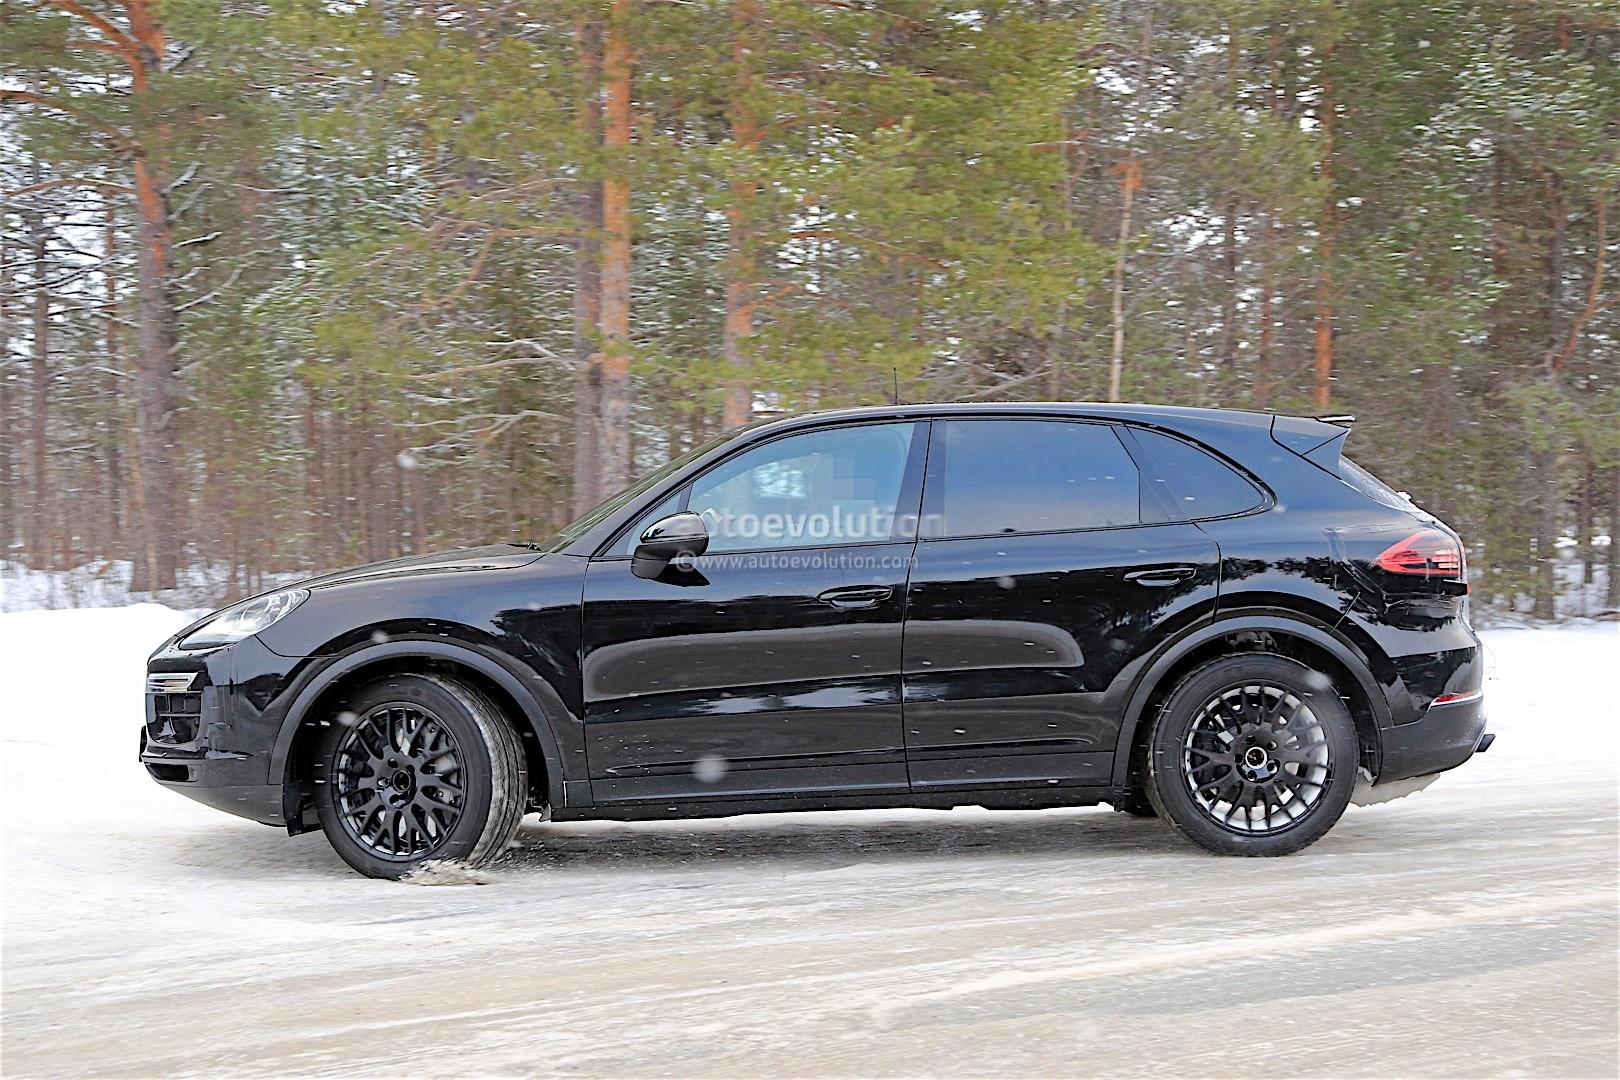 2016 - [Porsche] Cayenne III - Page 2 2018-porsche-cayenne-prototype-spied-less-disguised_6